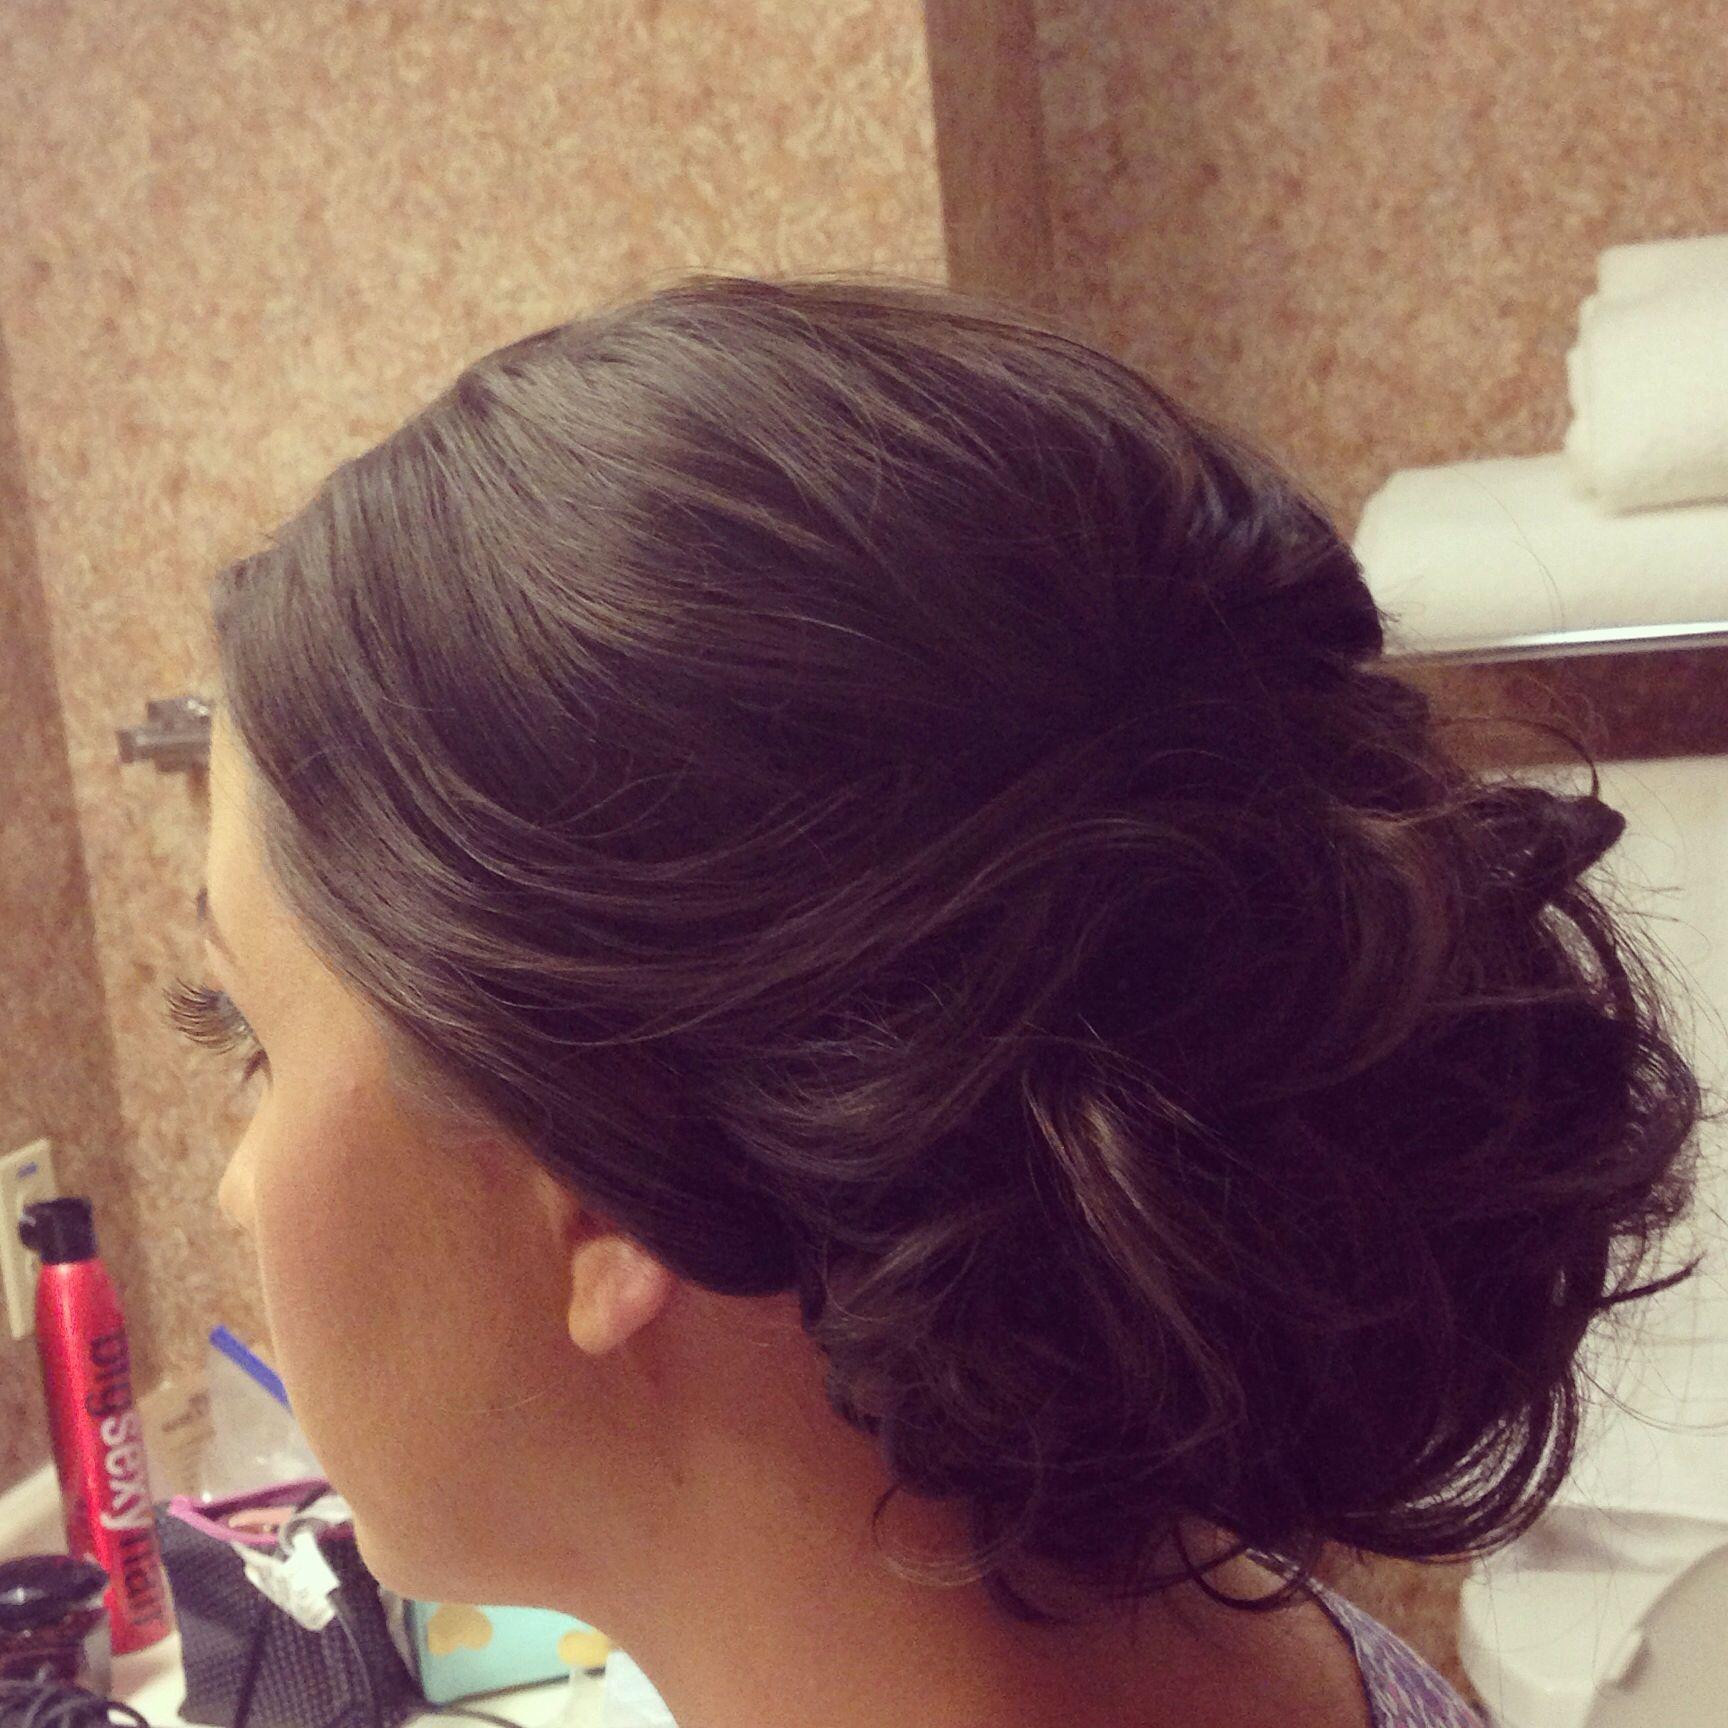 updo, wedding hair, wedding updo, romantic updo, beautiful hair